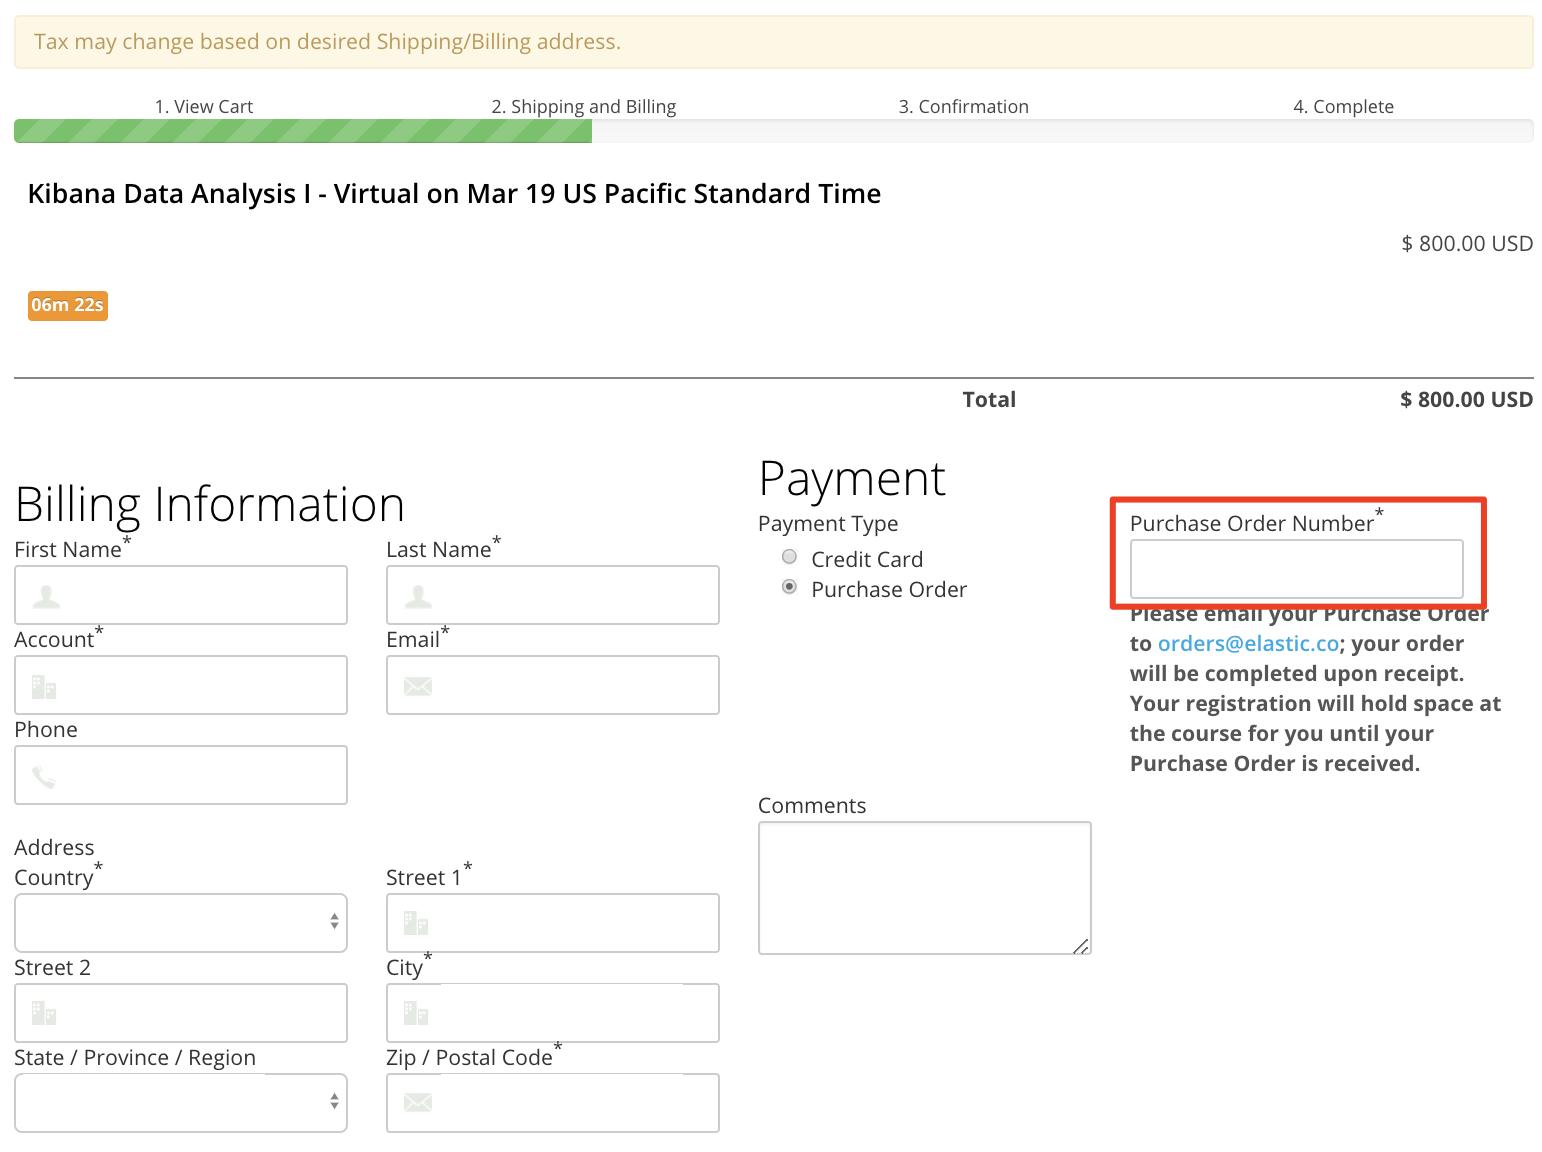 Screenshot: Purchase Order Number